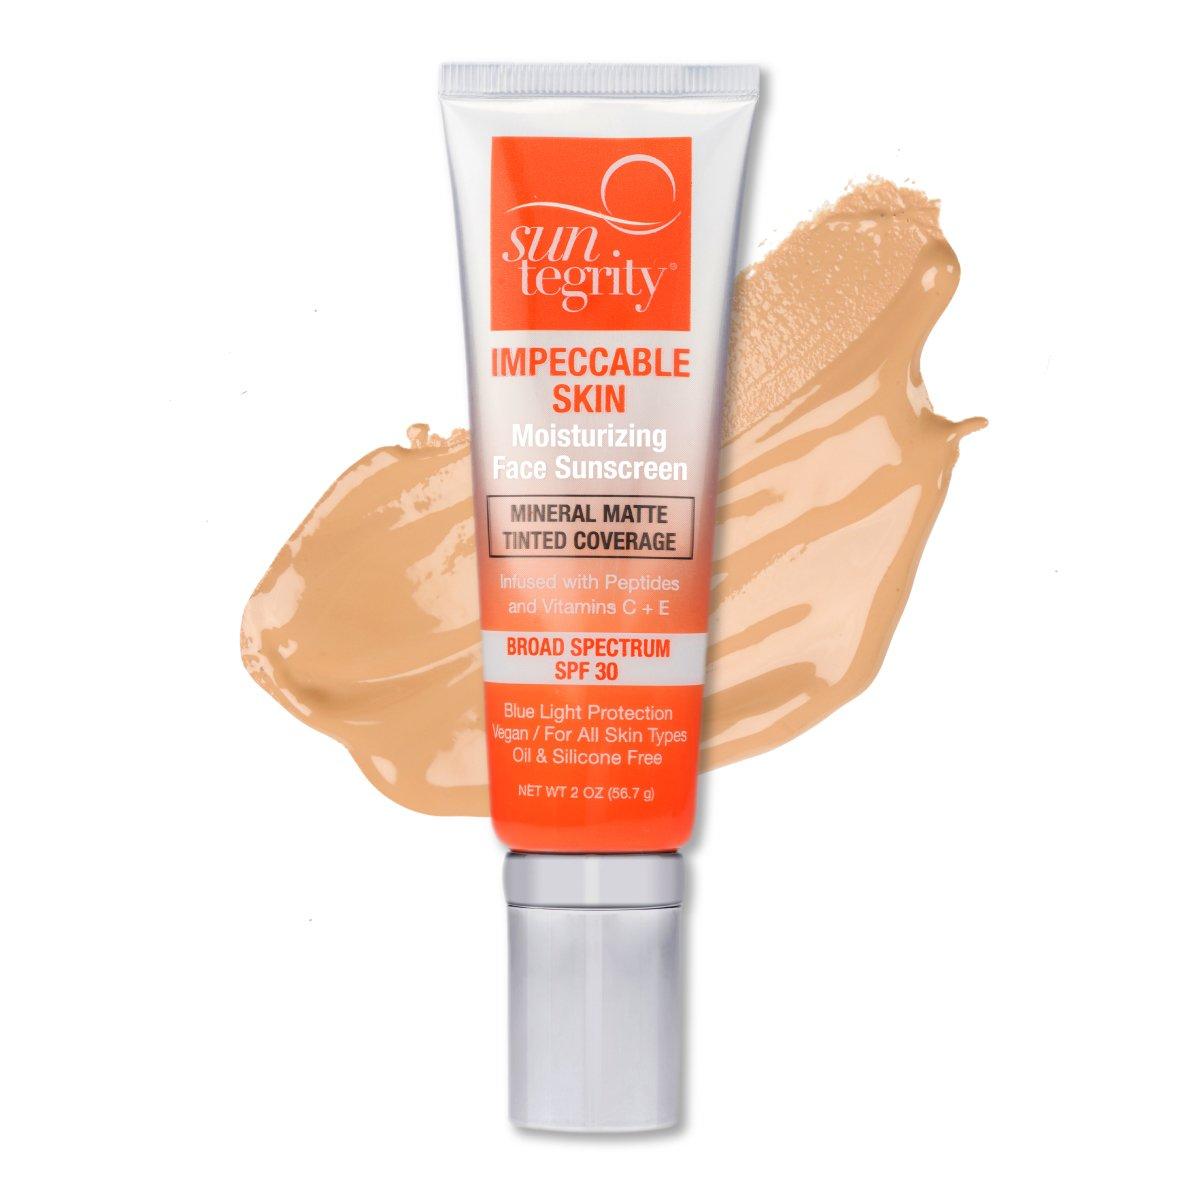 Suntegrity Impeccable Skin, Broad Spectrum SPF 30